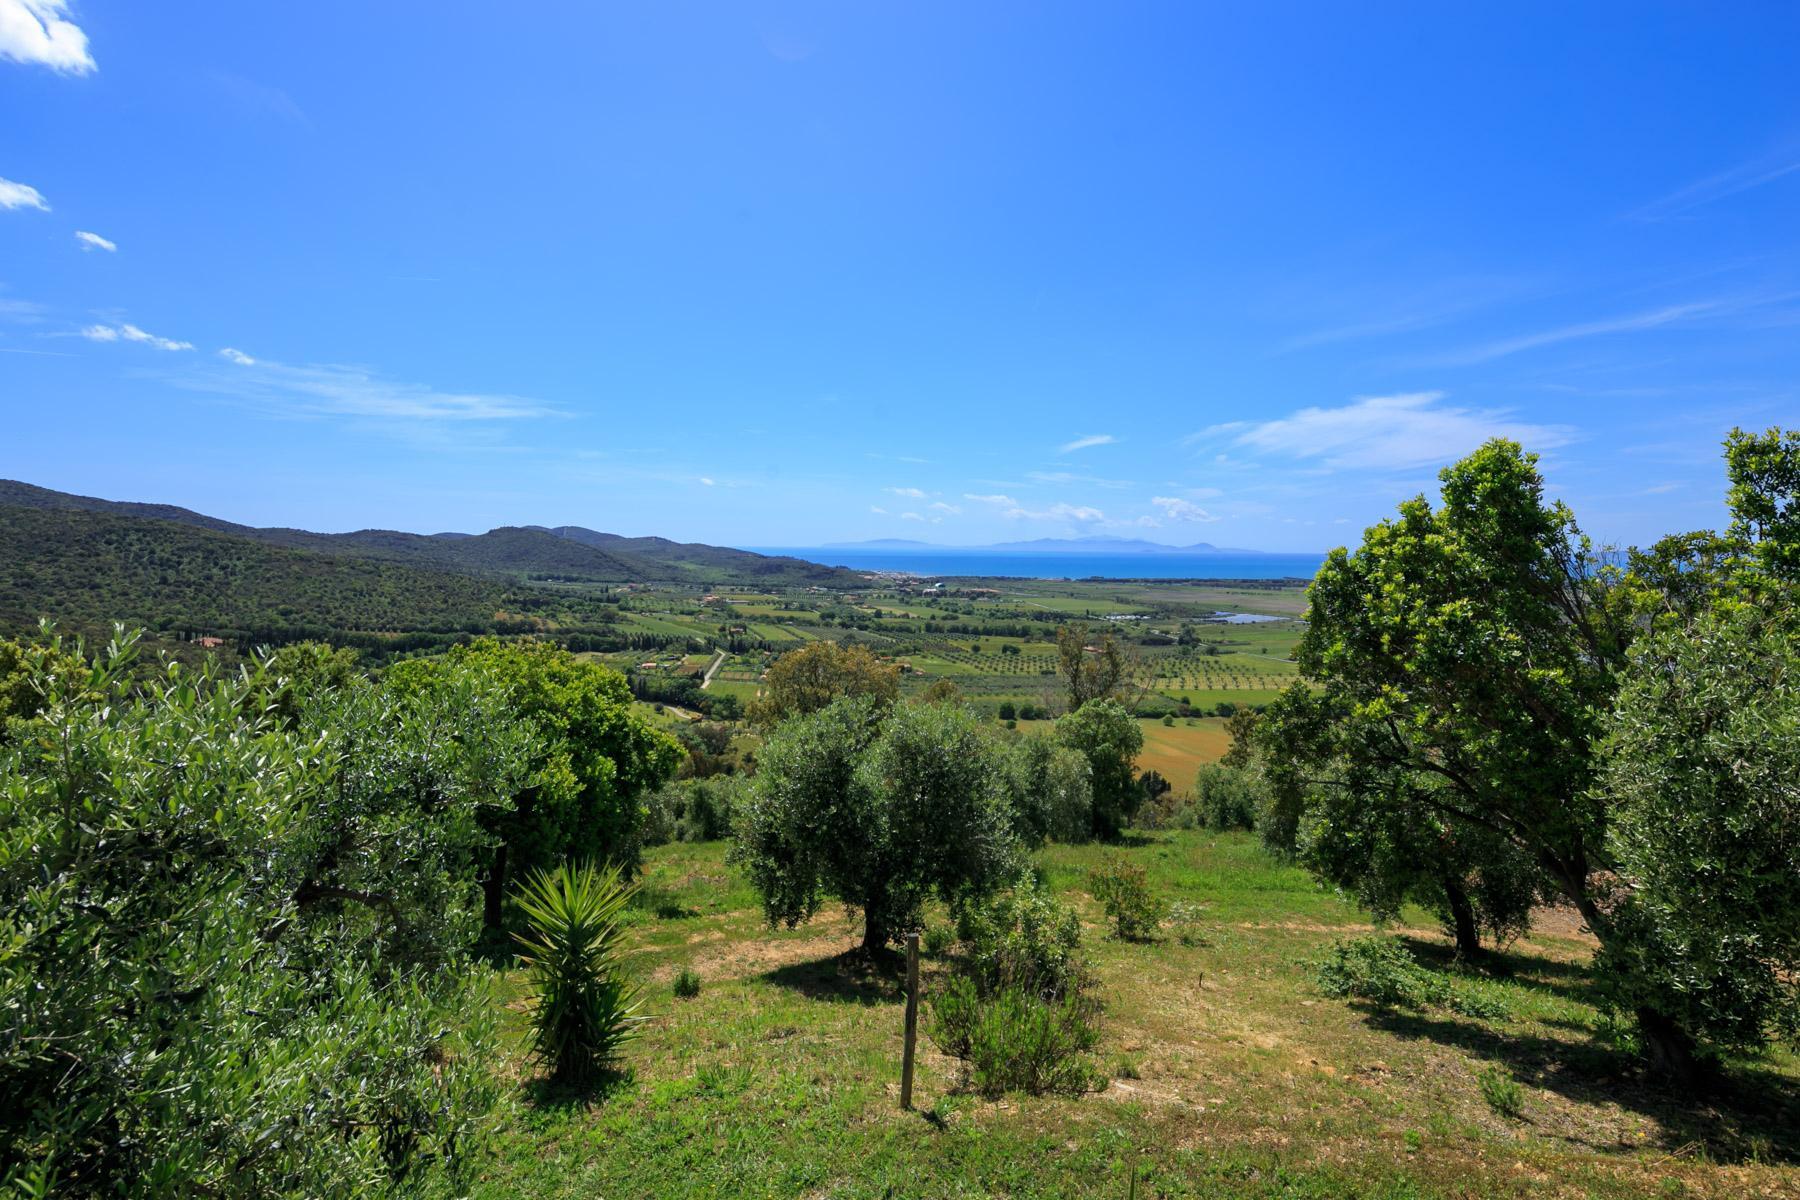 Villa historique avec vue imprenable sur le golfe de Scarlino - 6